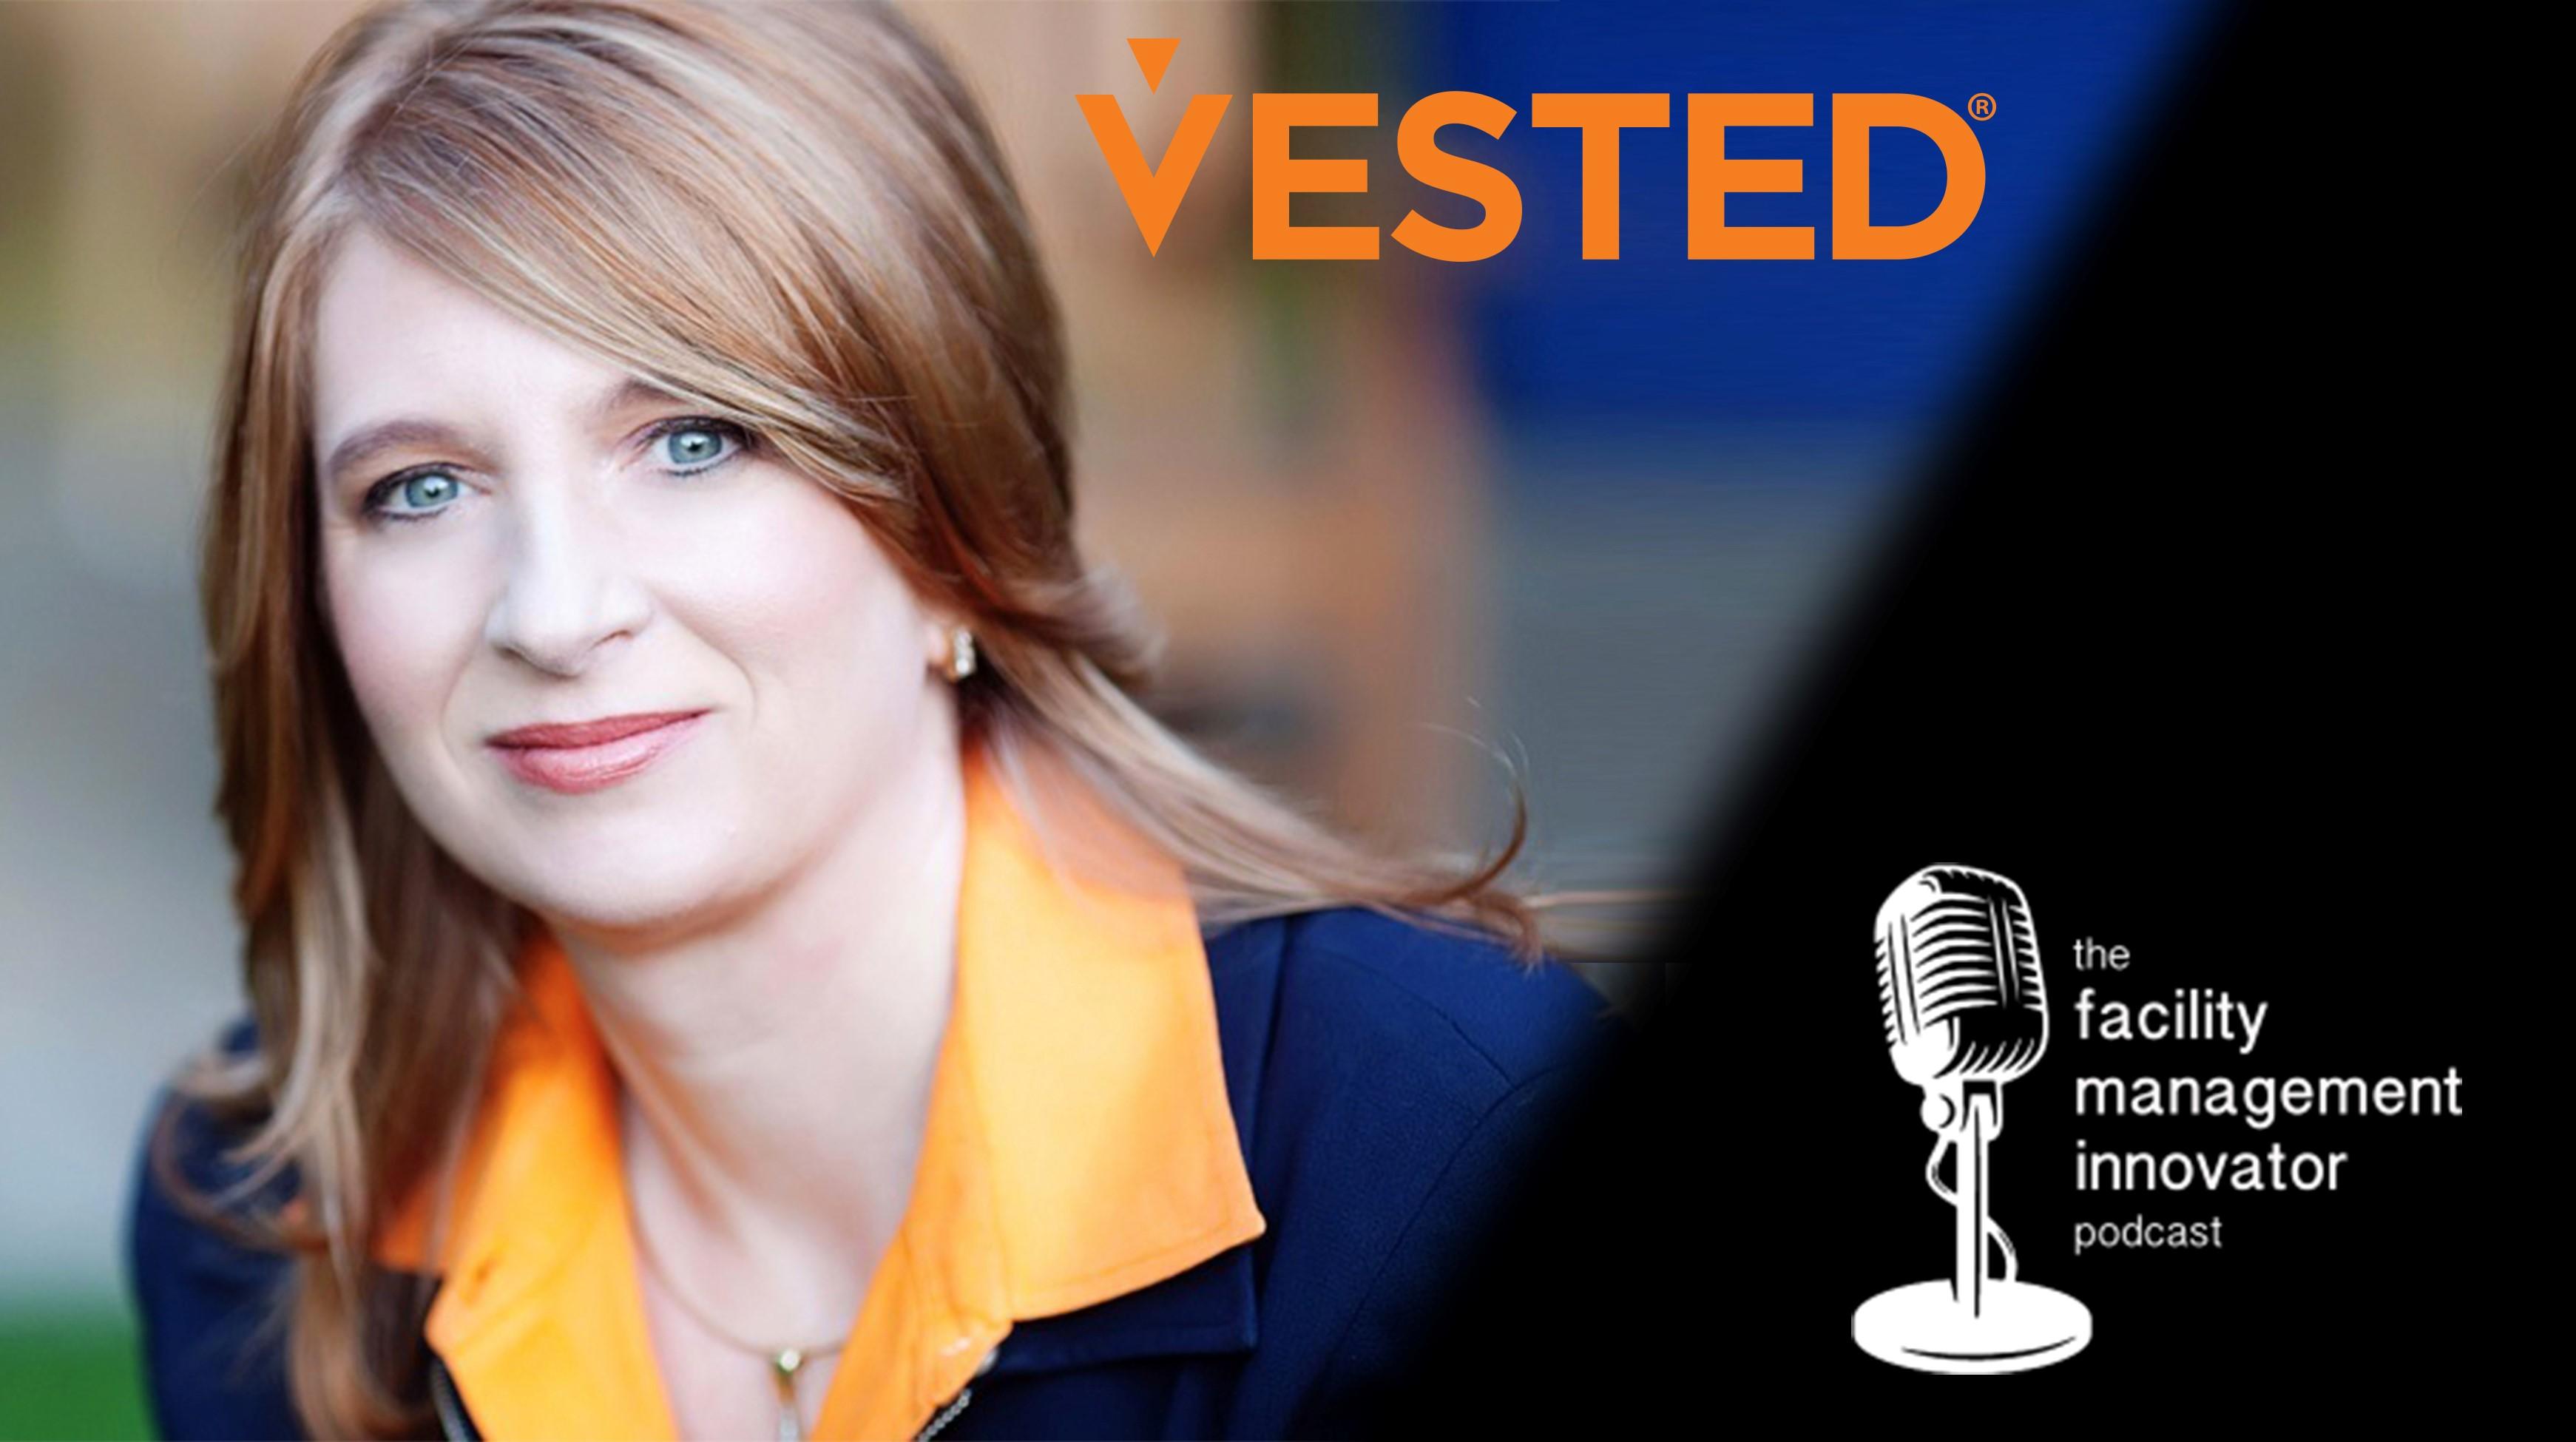 Ep. 63: Vested Business Model for Highly Collaborative Relationships in FM | Kate Vitasek